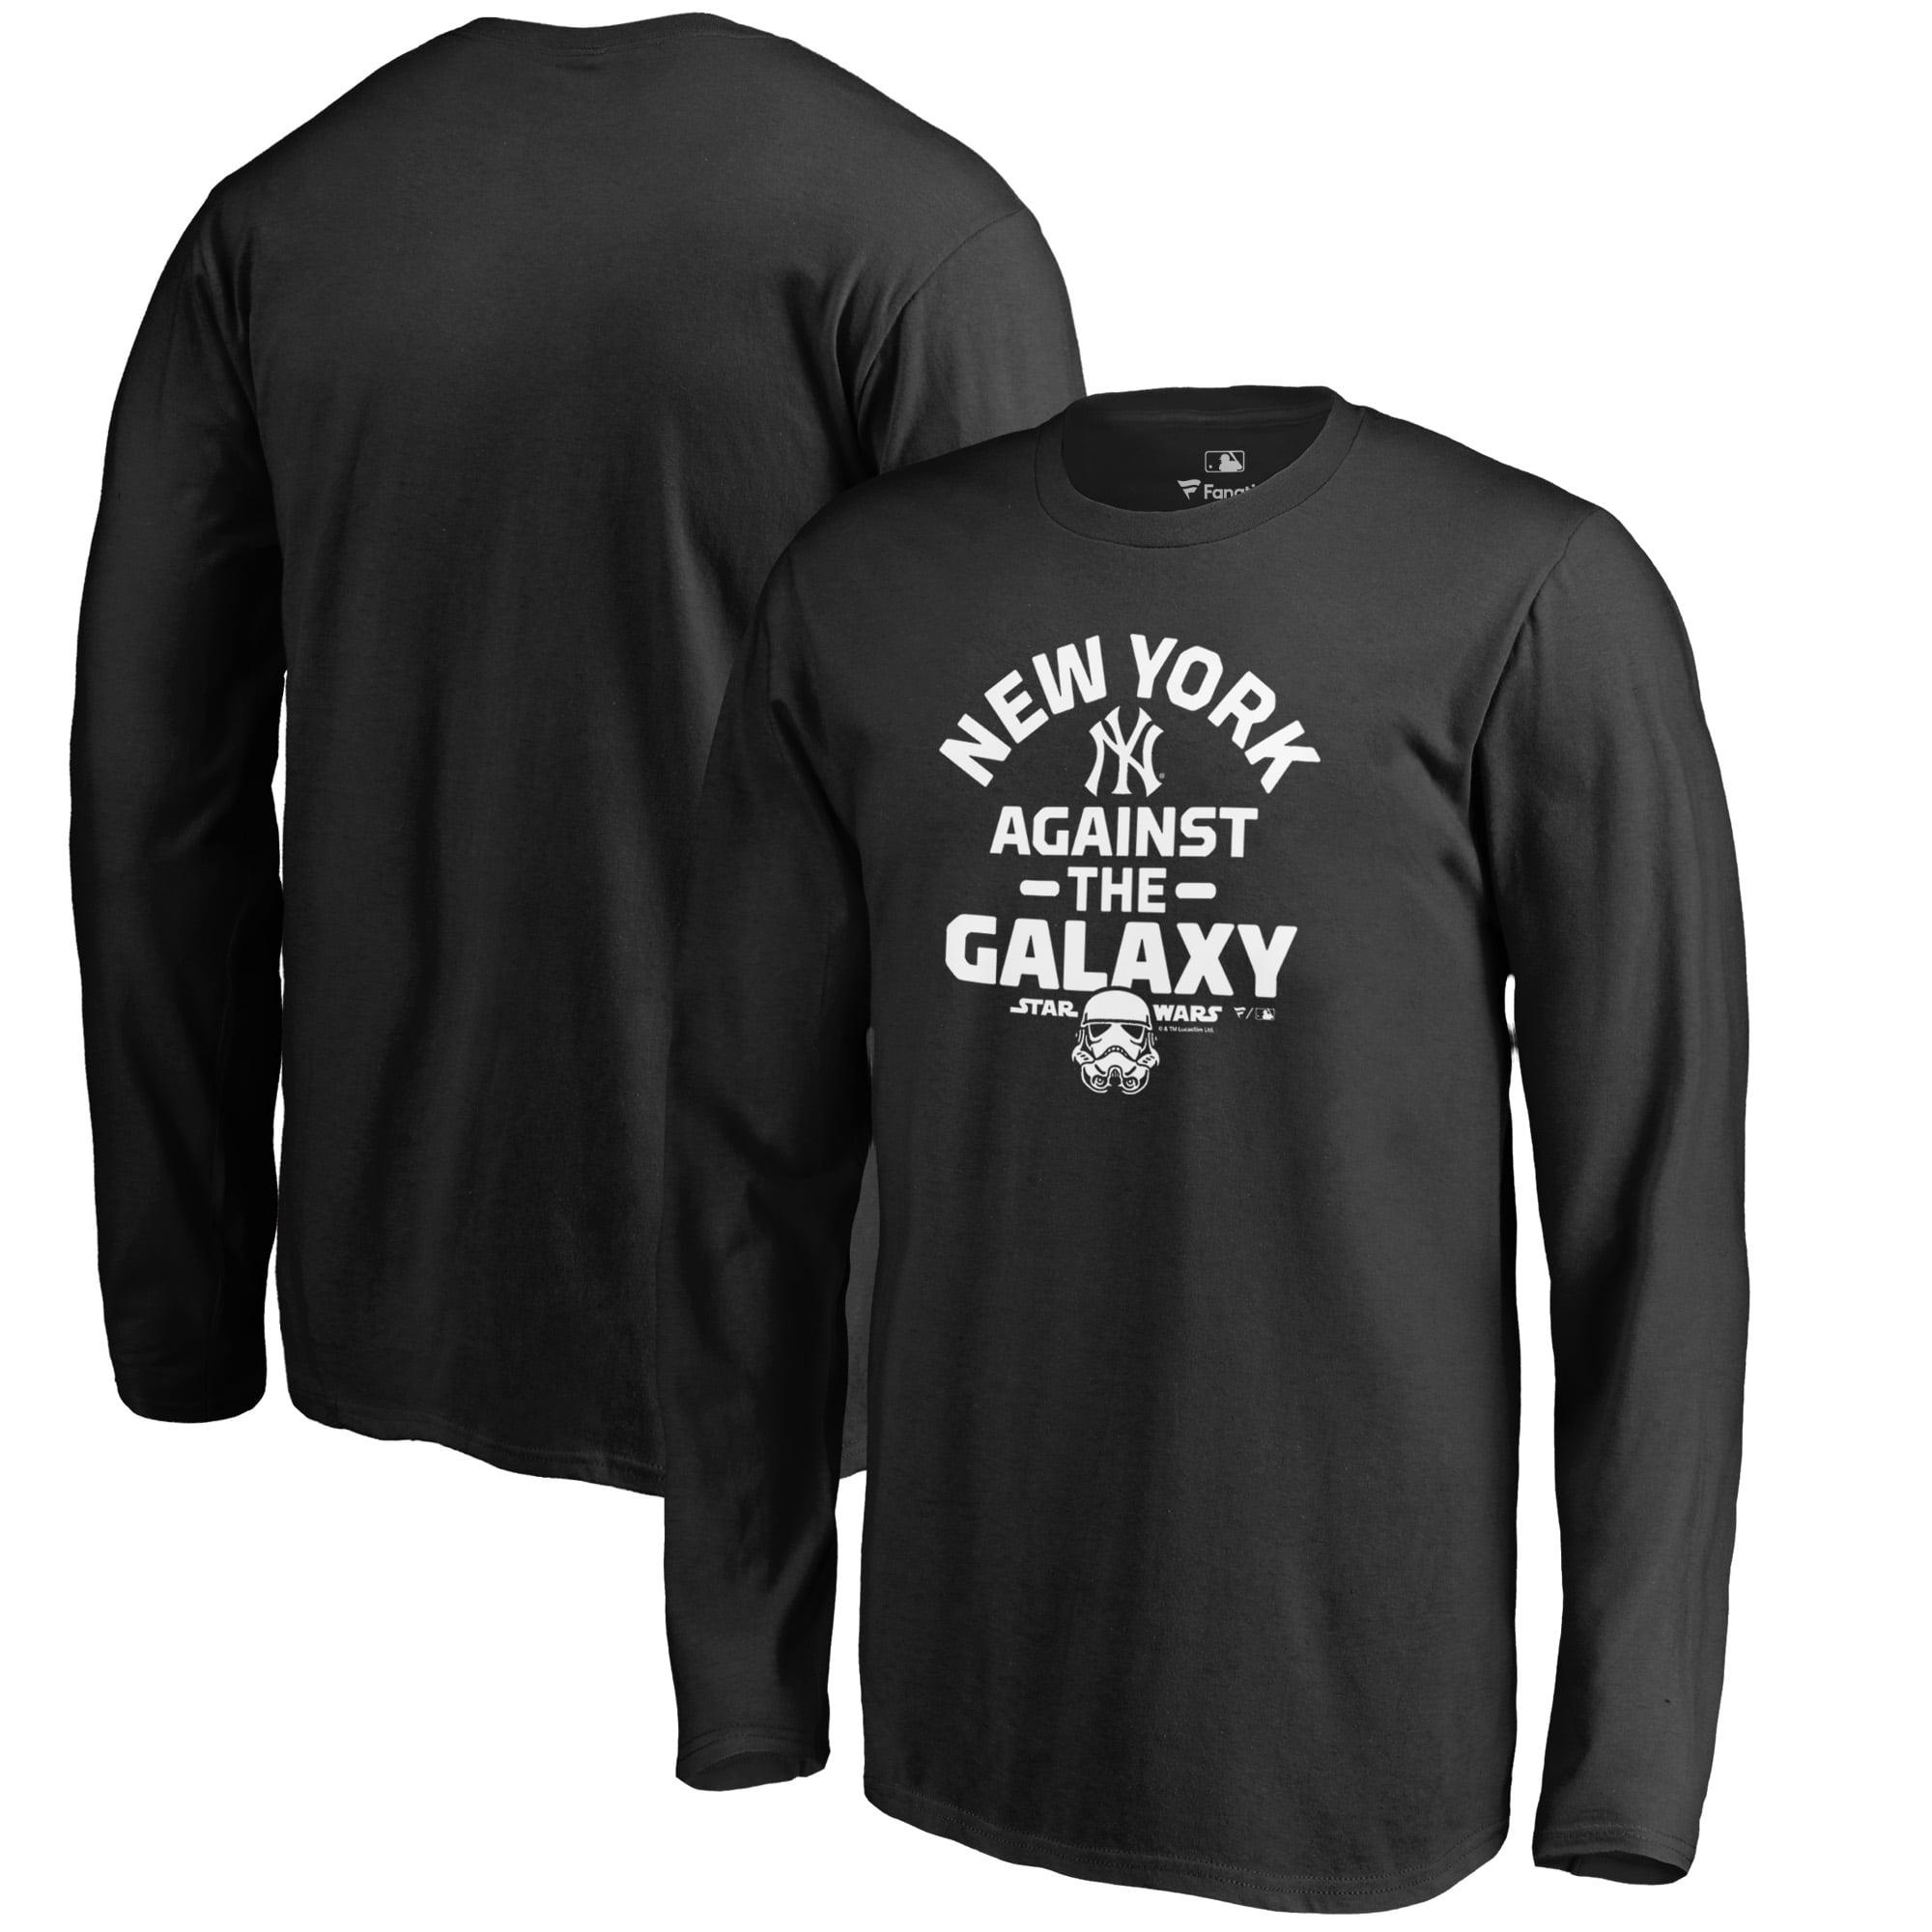 New York Yankees Fanatics Branded Youth MLB Star Wars Against The Galaxy Long Sleeve T-Shirt - Black